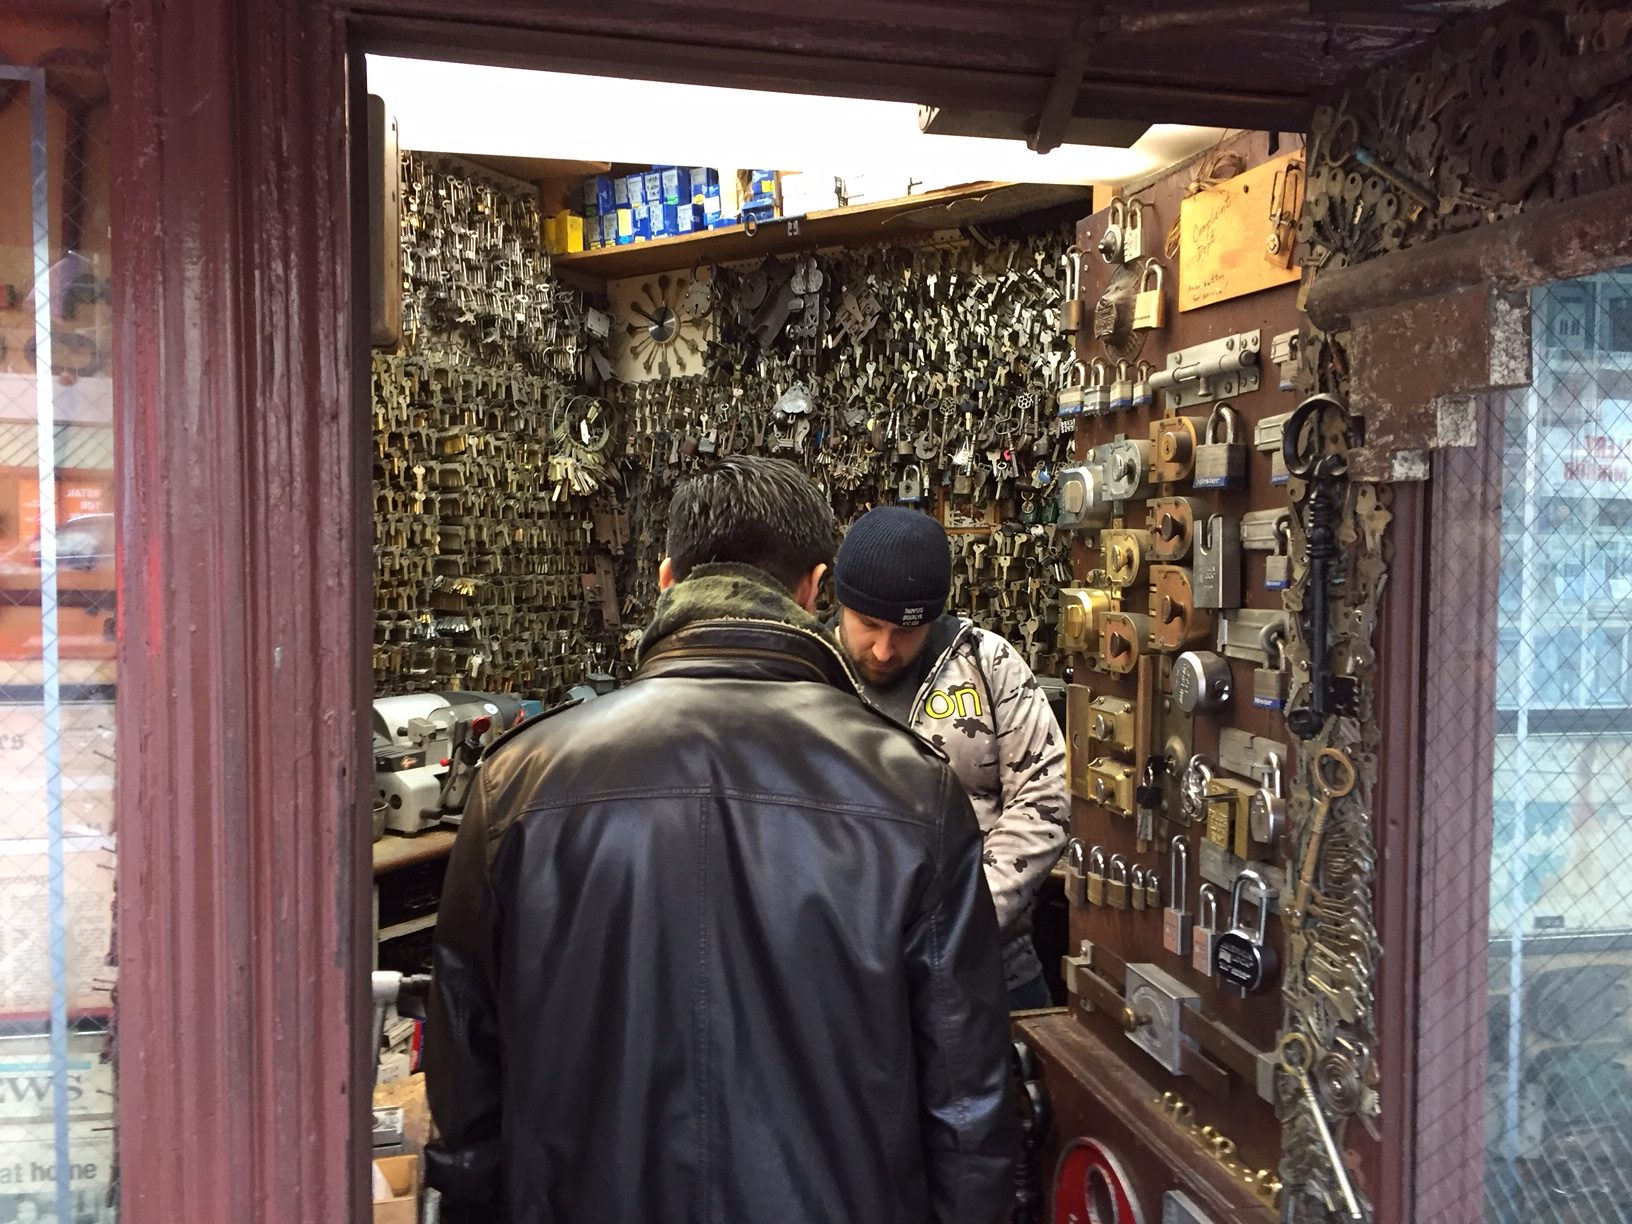 Greenwich Locksmiths Won't Leave the Village, Even for $2M | StreetEasy